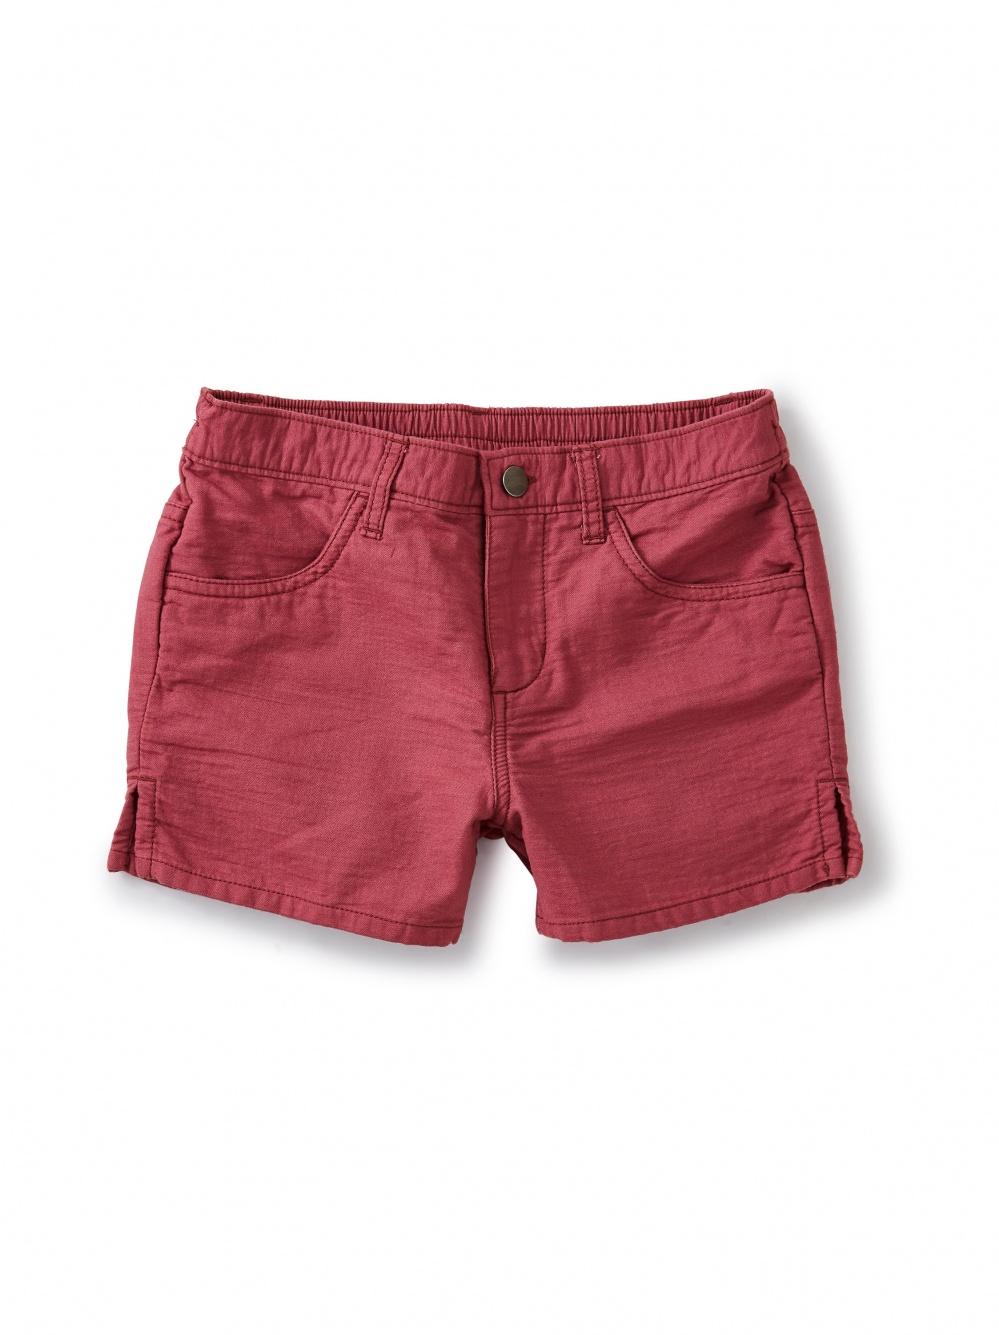 Four Pocket Short